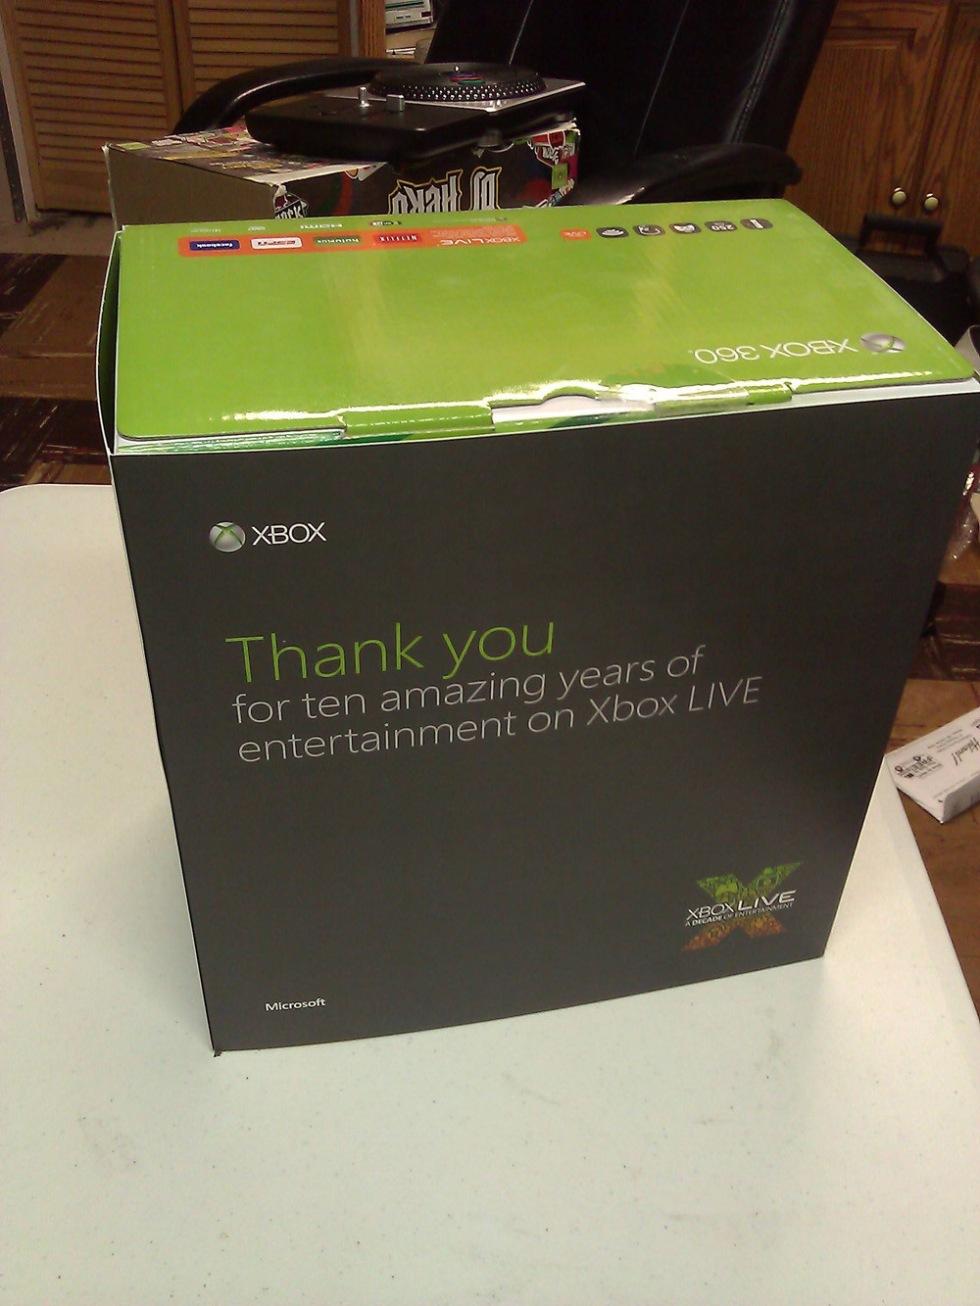 gratis spel på xbox live